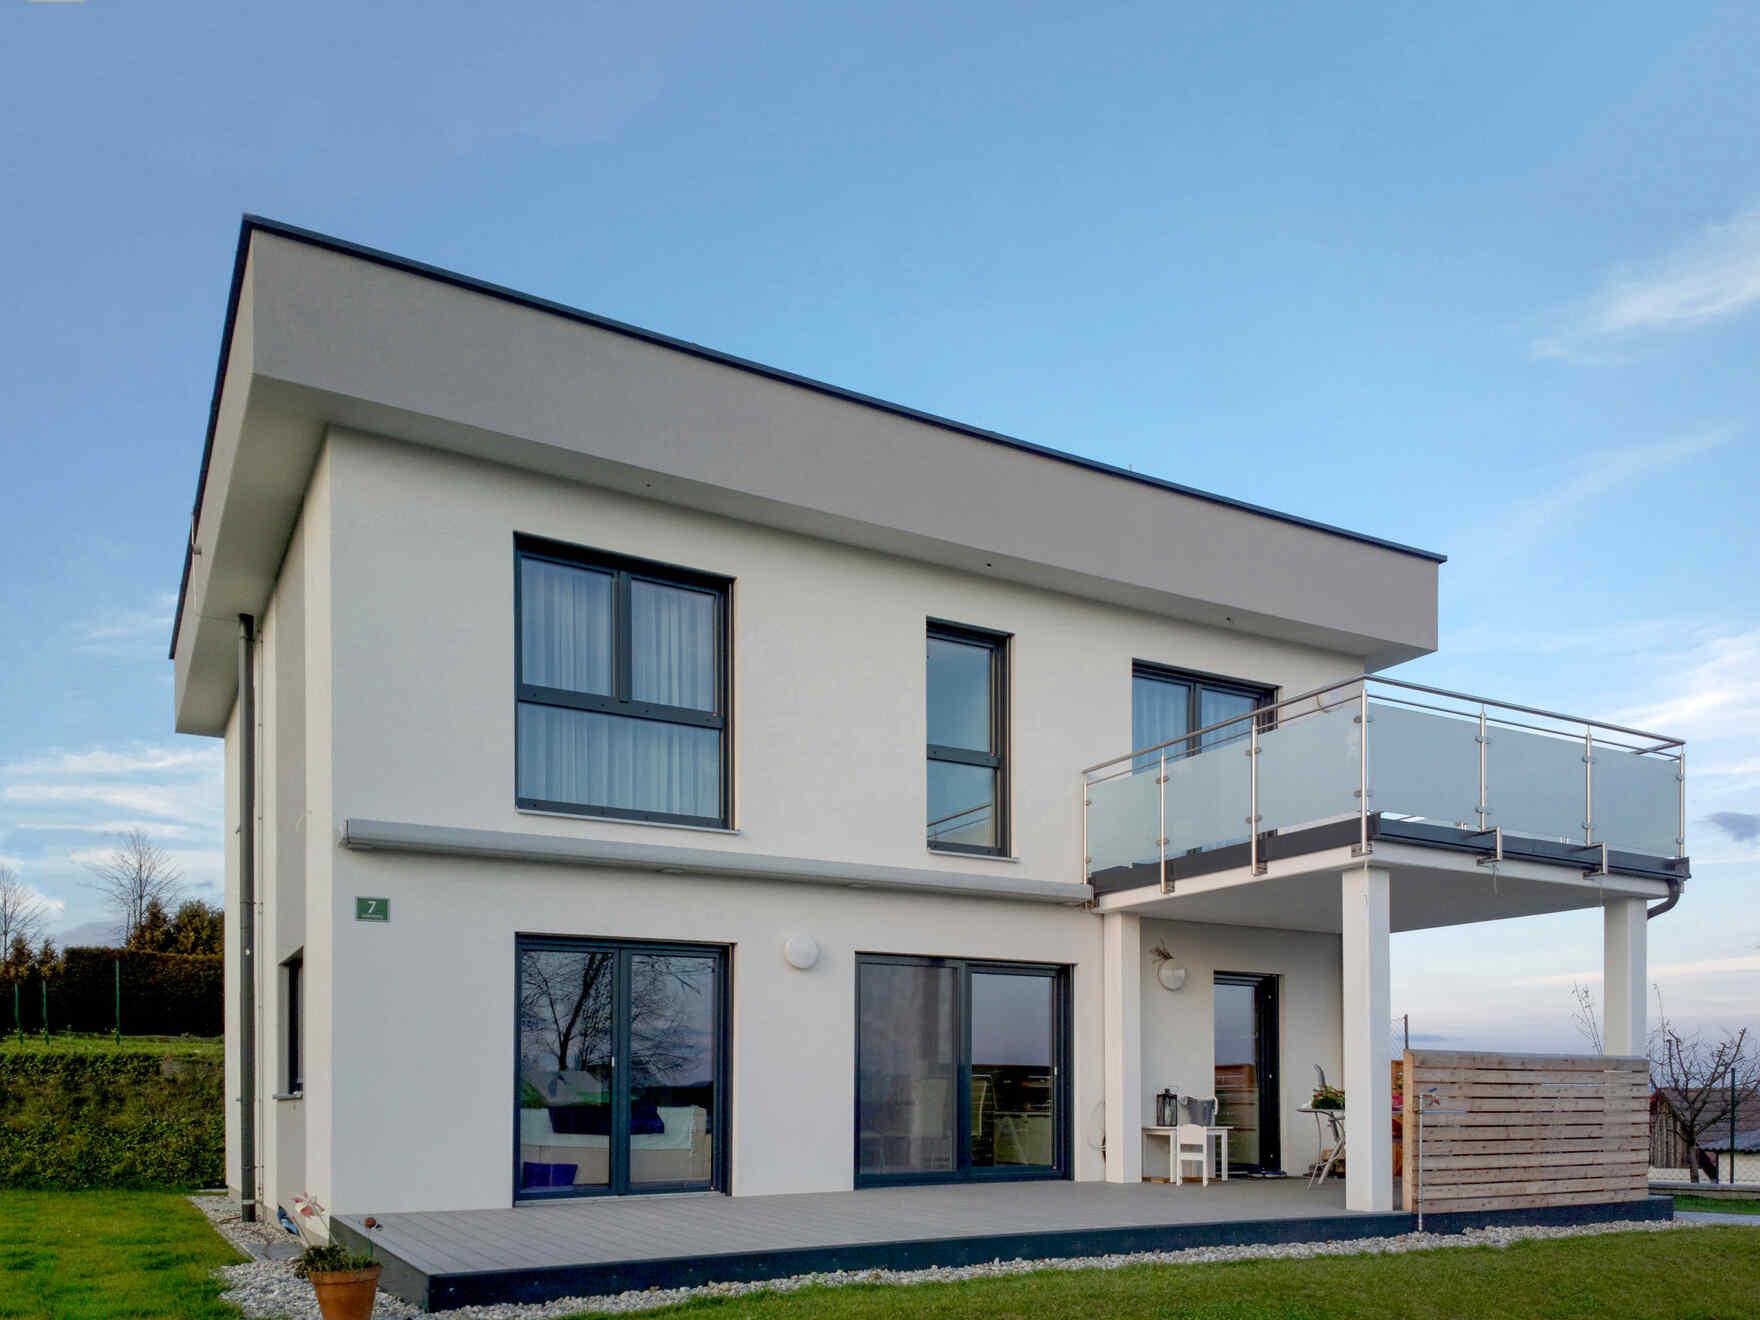 Fertighaus, Fertigteilhaus - Vario-Haus Bauen